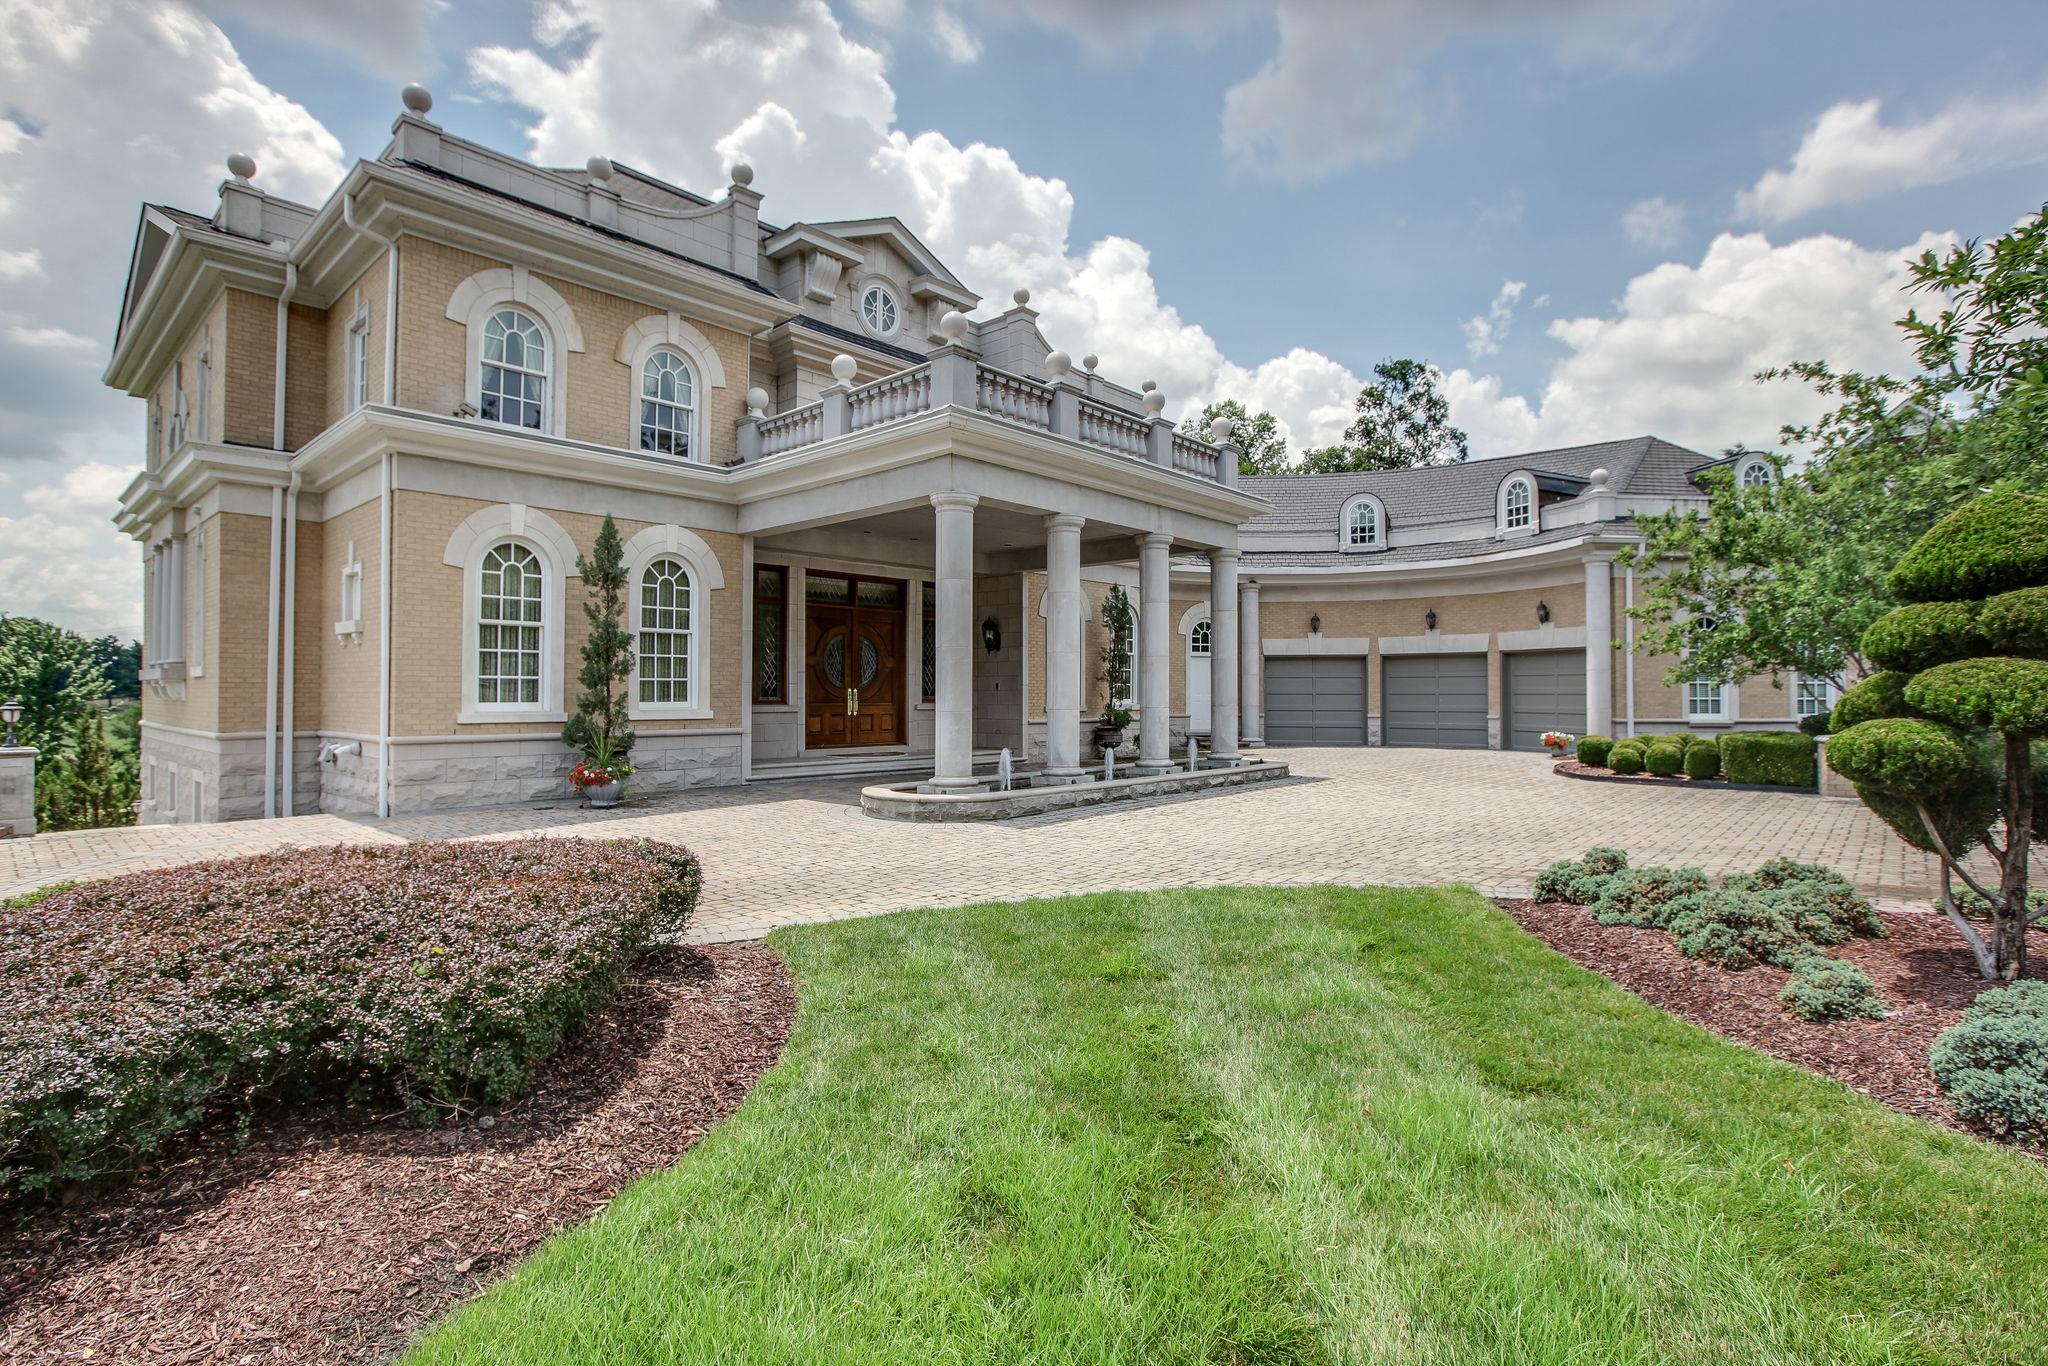 2 Carmel Ln, Brentwood, TN 37027 - Brentwood, TN real estate listing